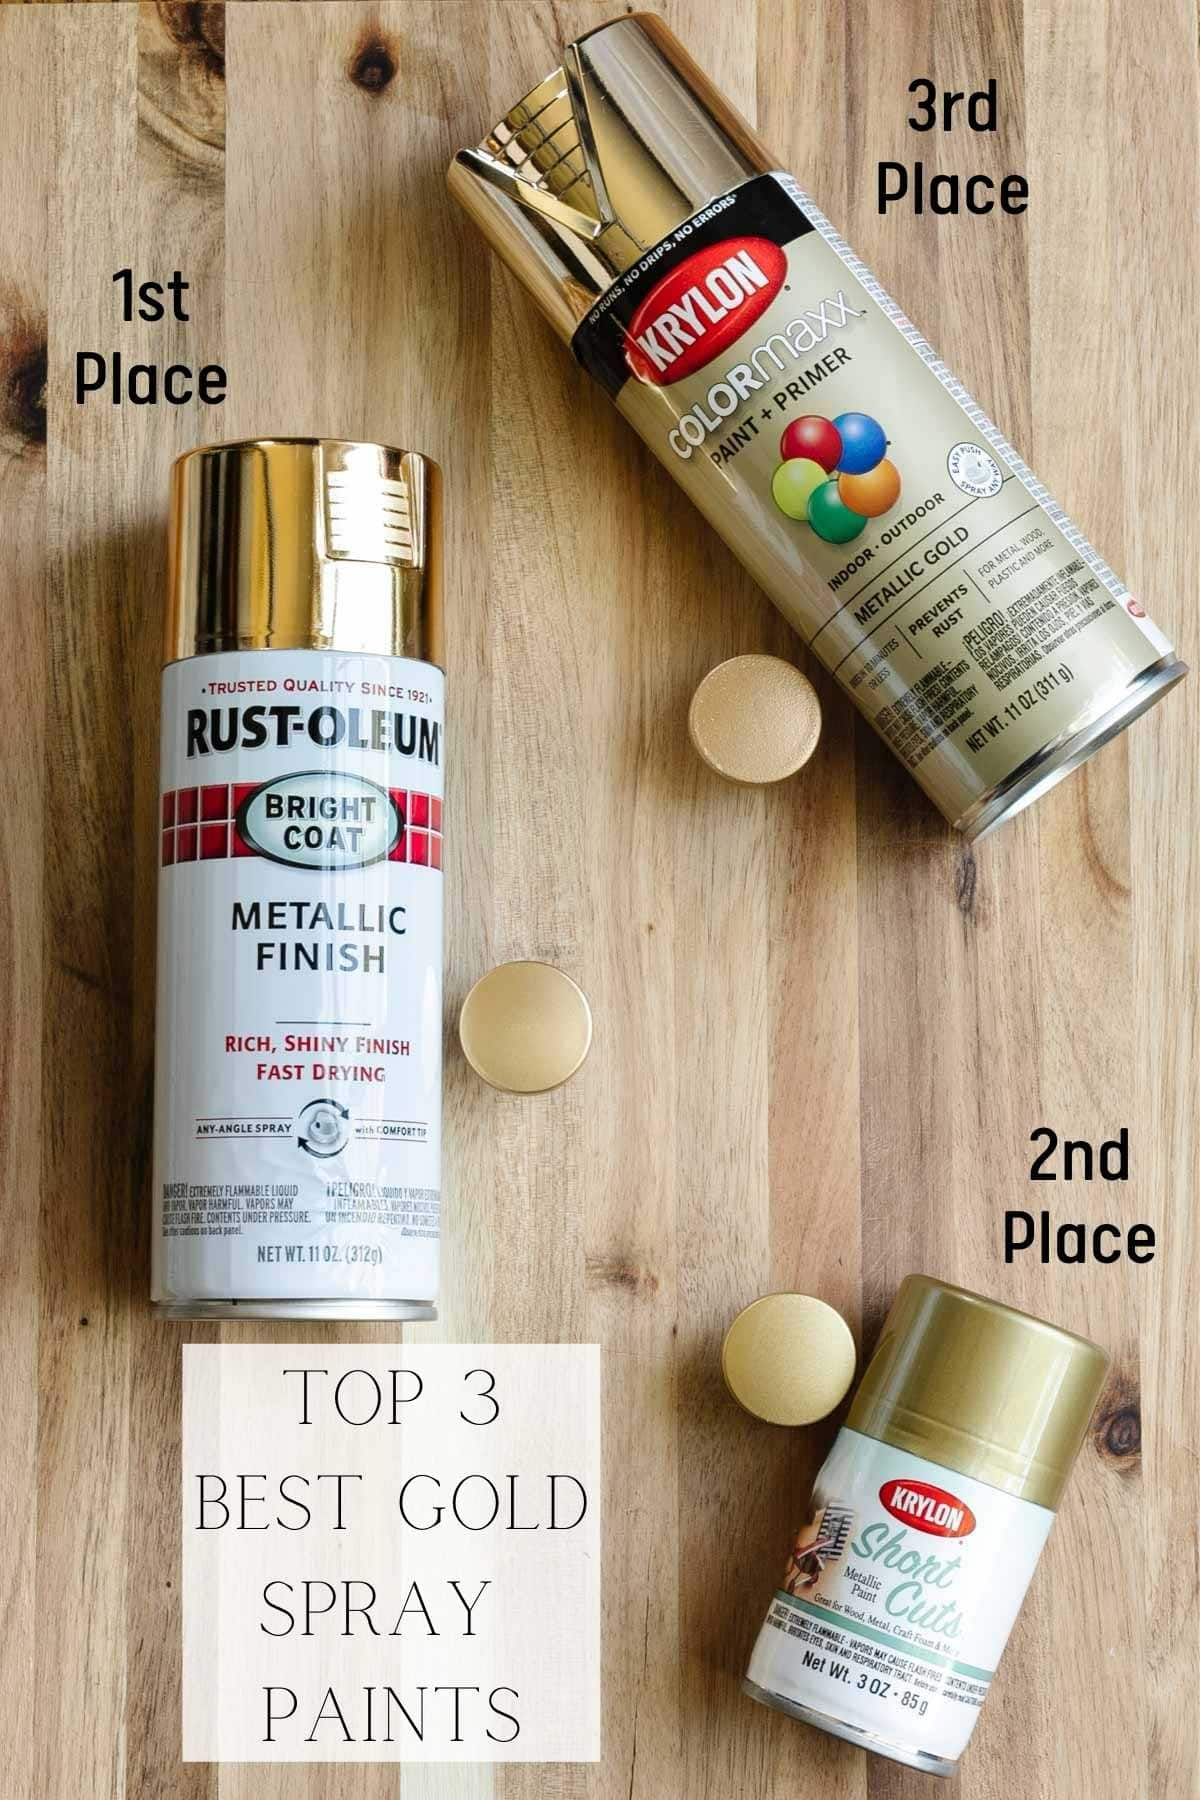 top 3 best gold spray paints